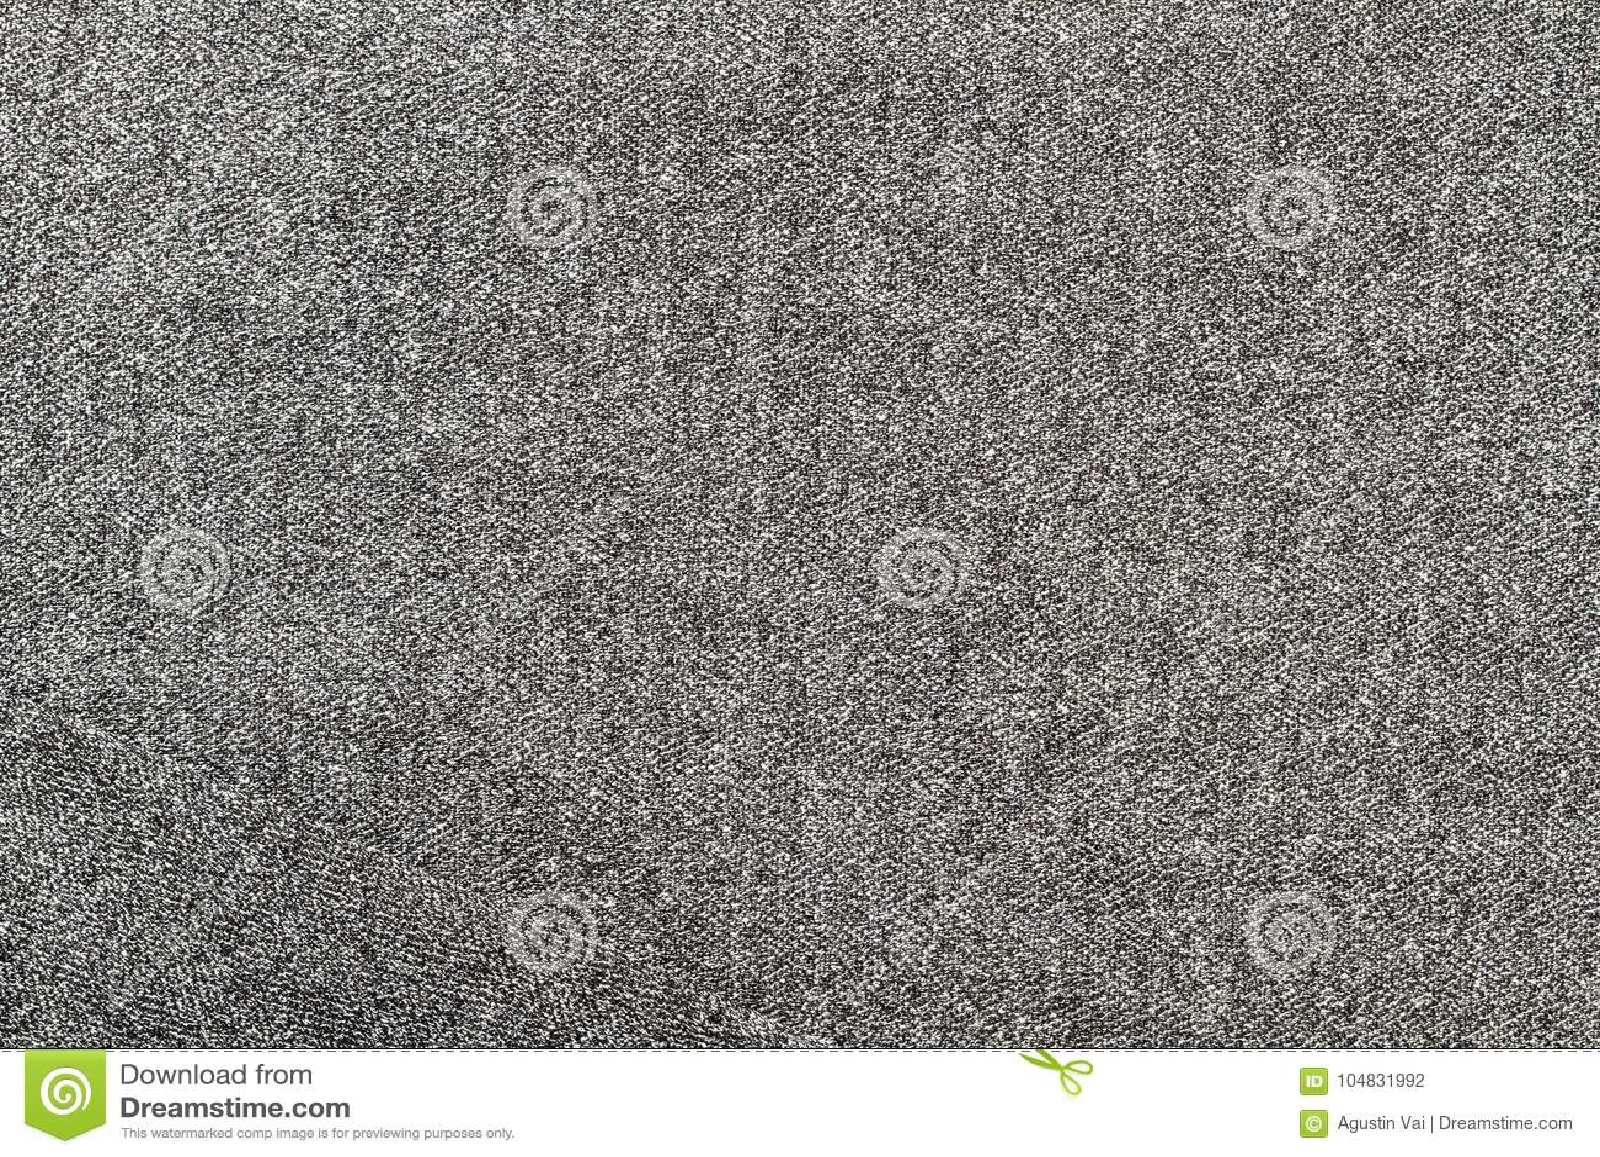 Wool gray texture